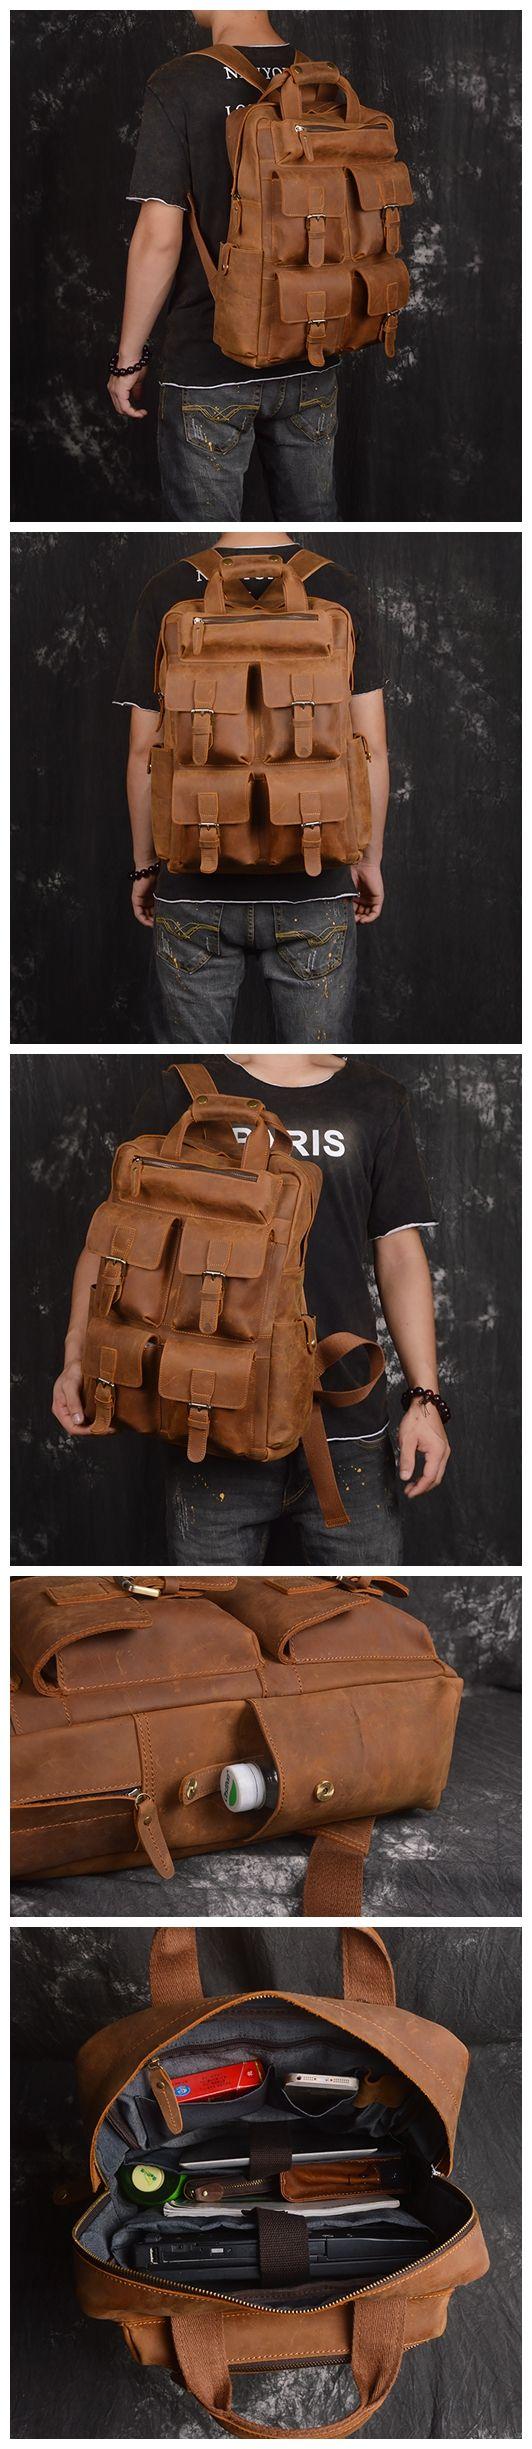 Handmade Genuine Leather Backpack, Travel Backpack, School Backpack